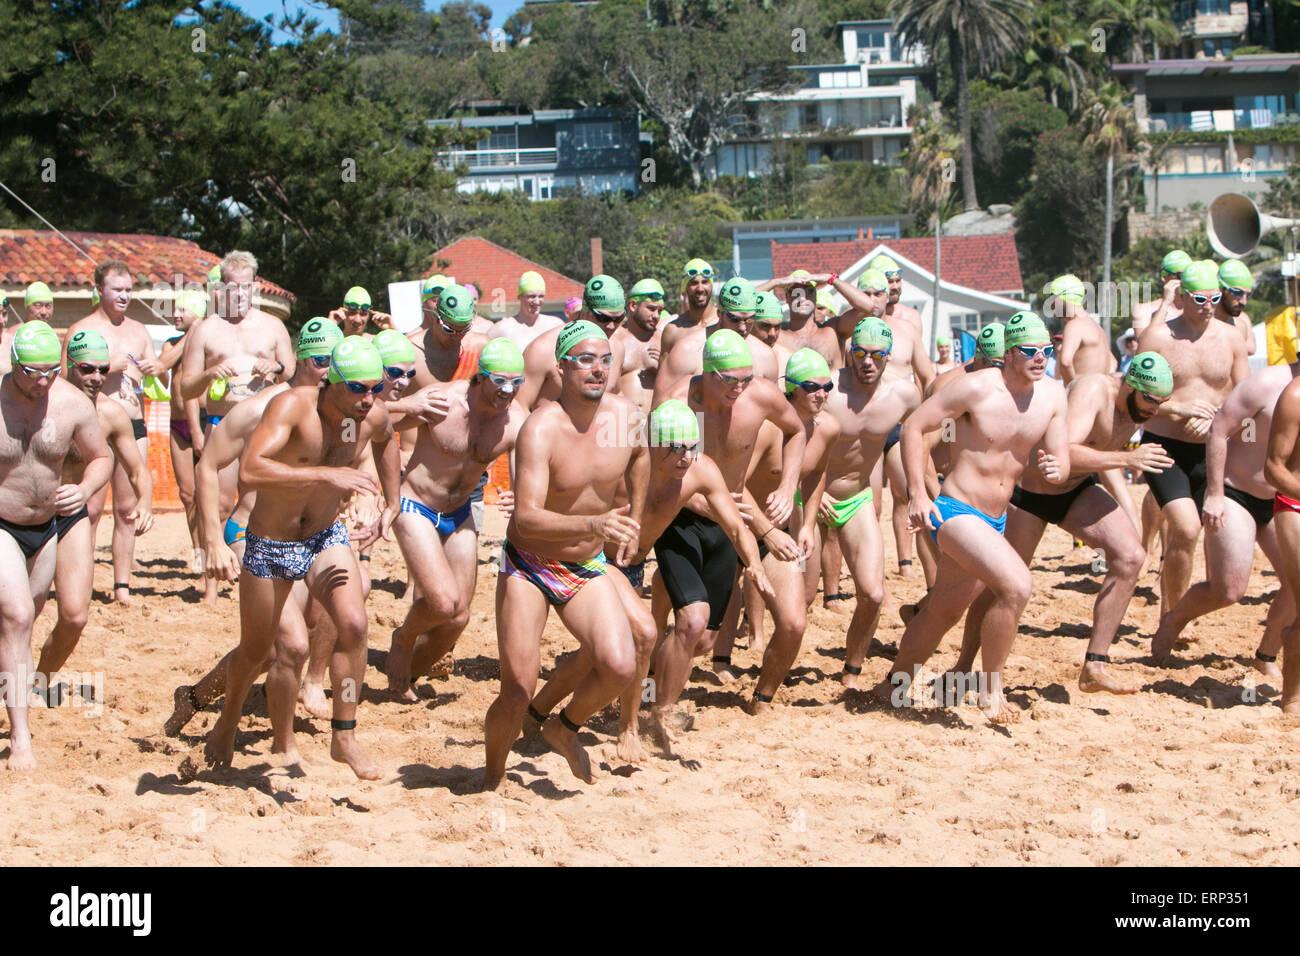 male competitors in the 41st Palm beach to whale beach big swim ocean swim,Sydney,Australia - Stock Image